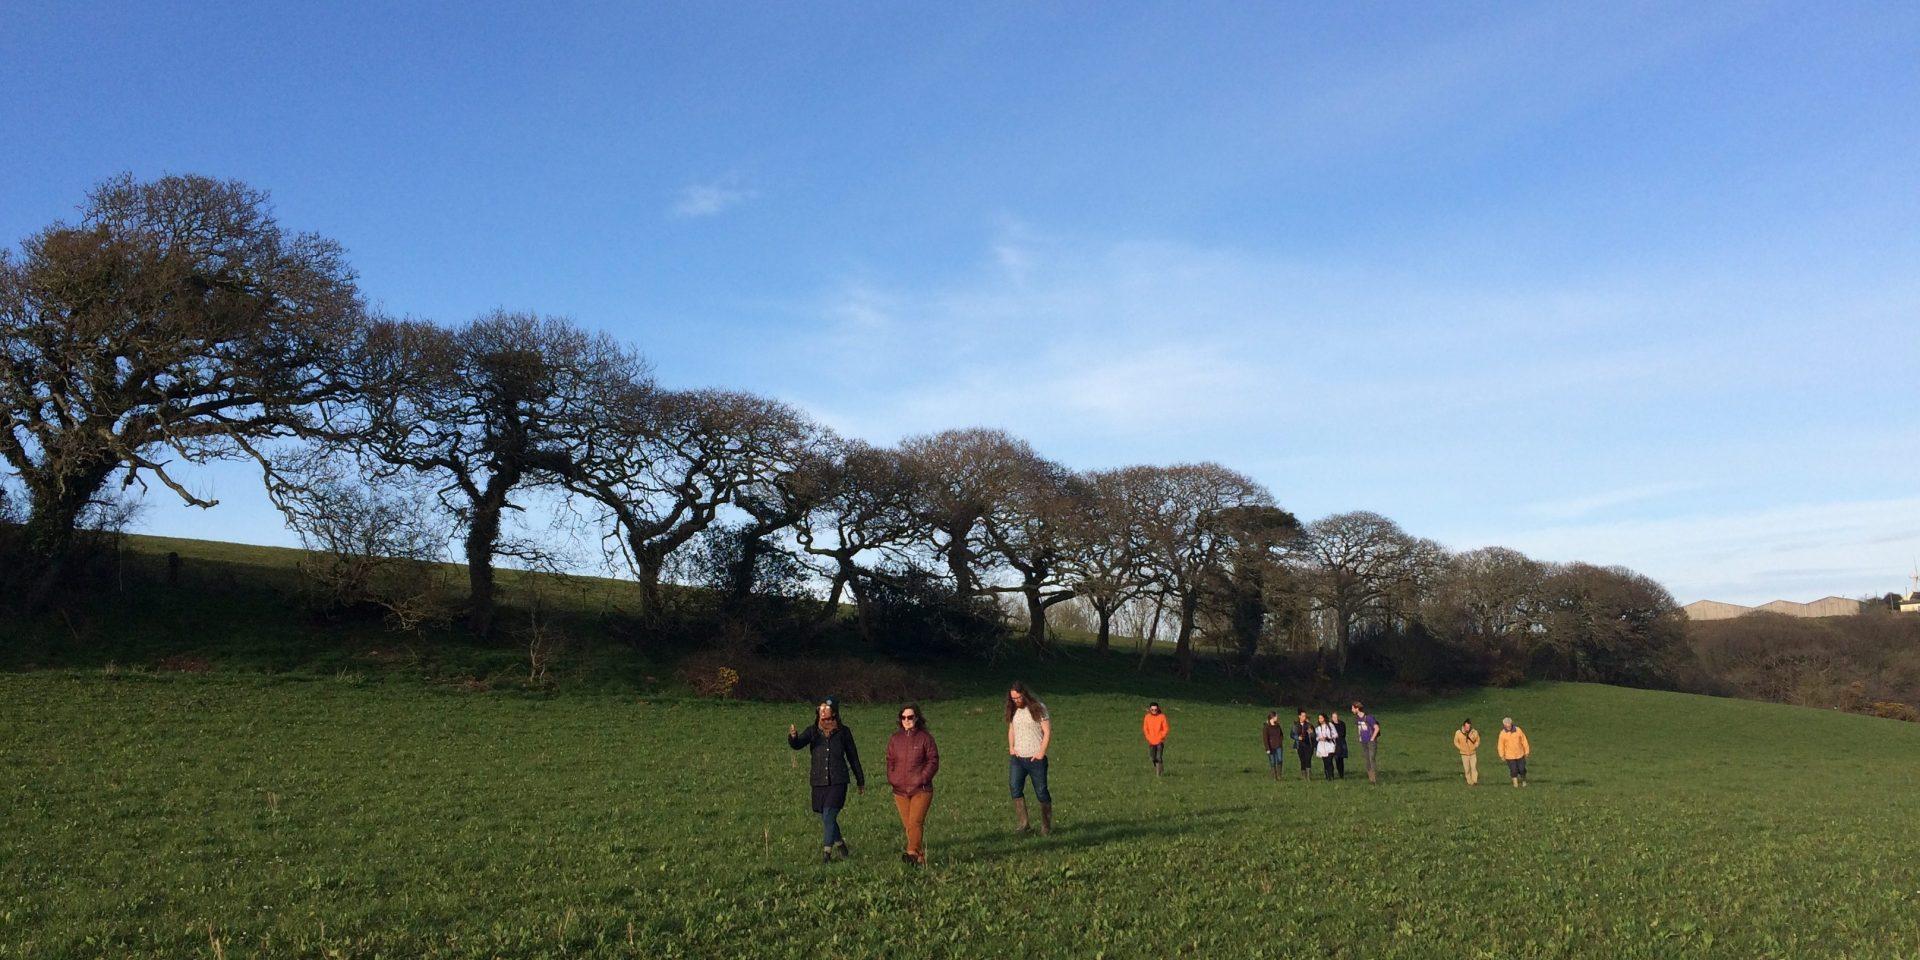 People walking through a field